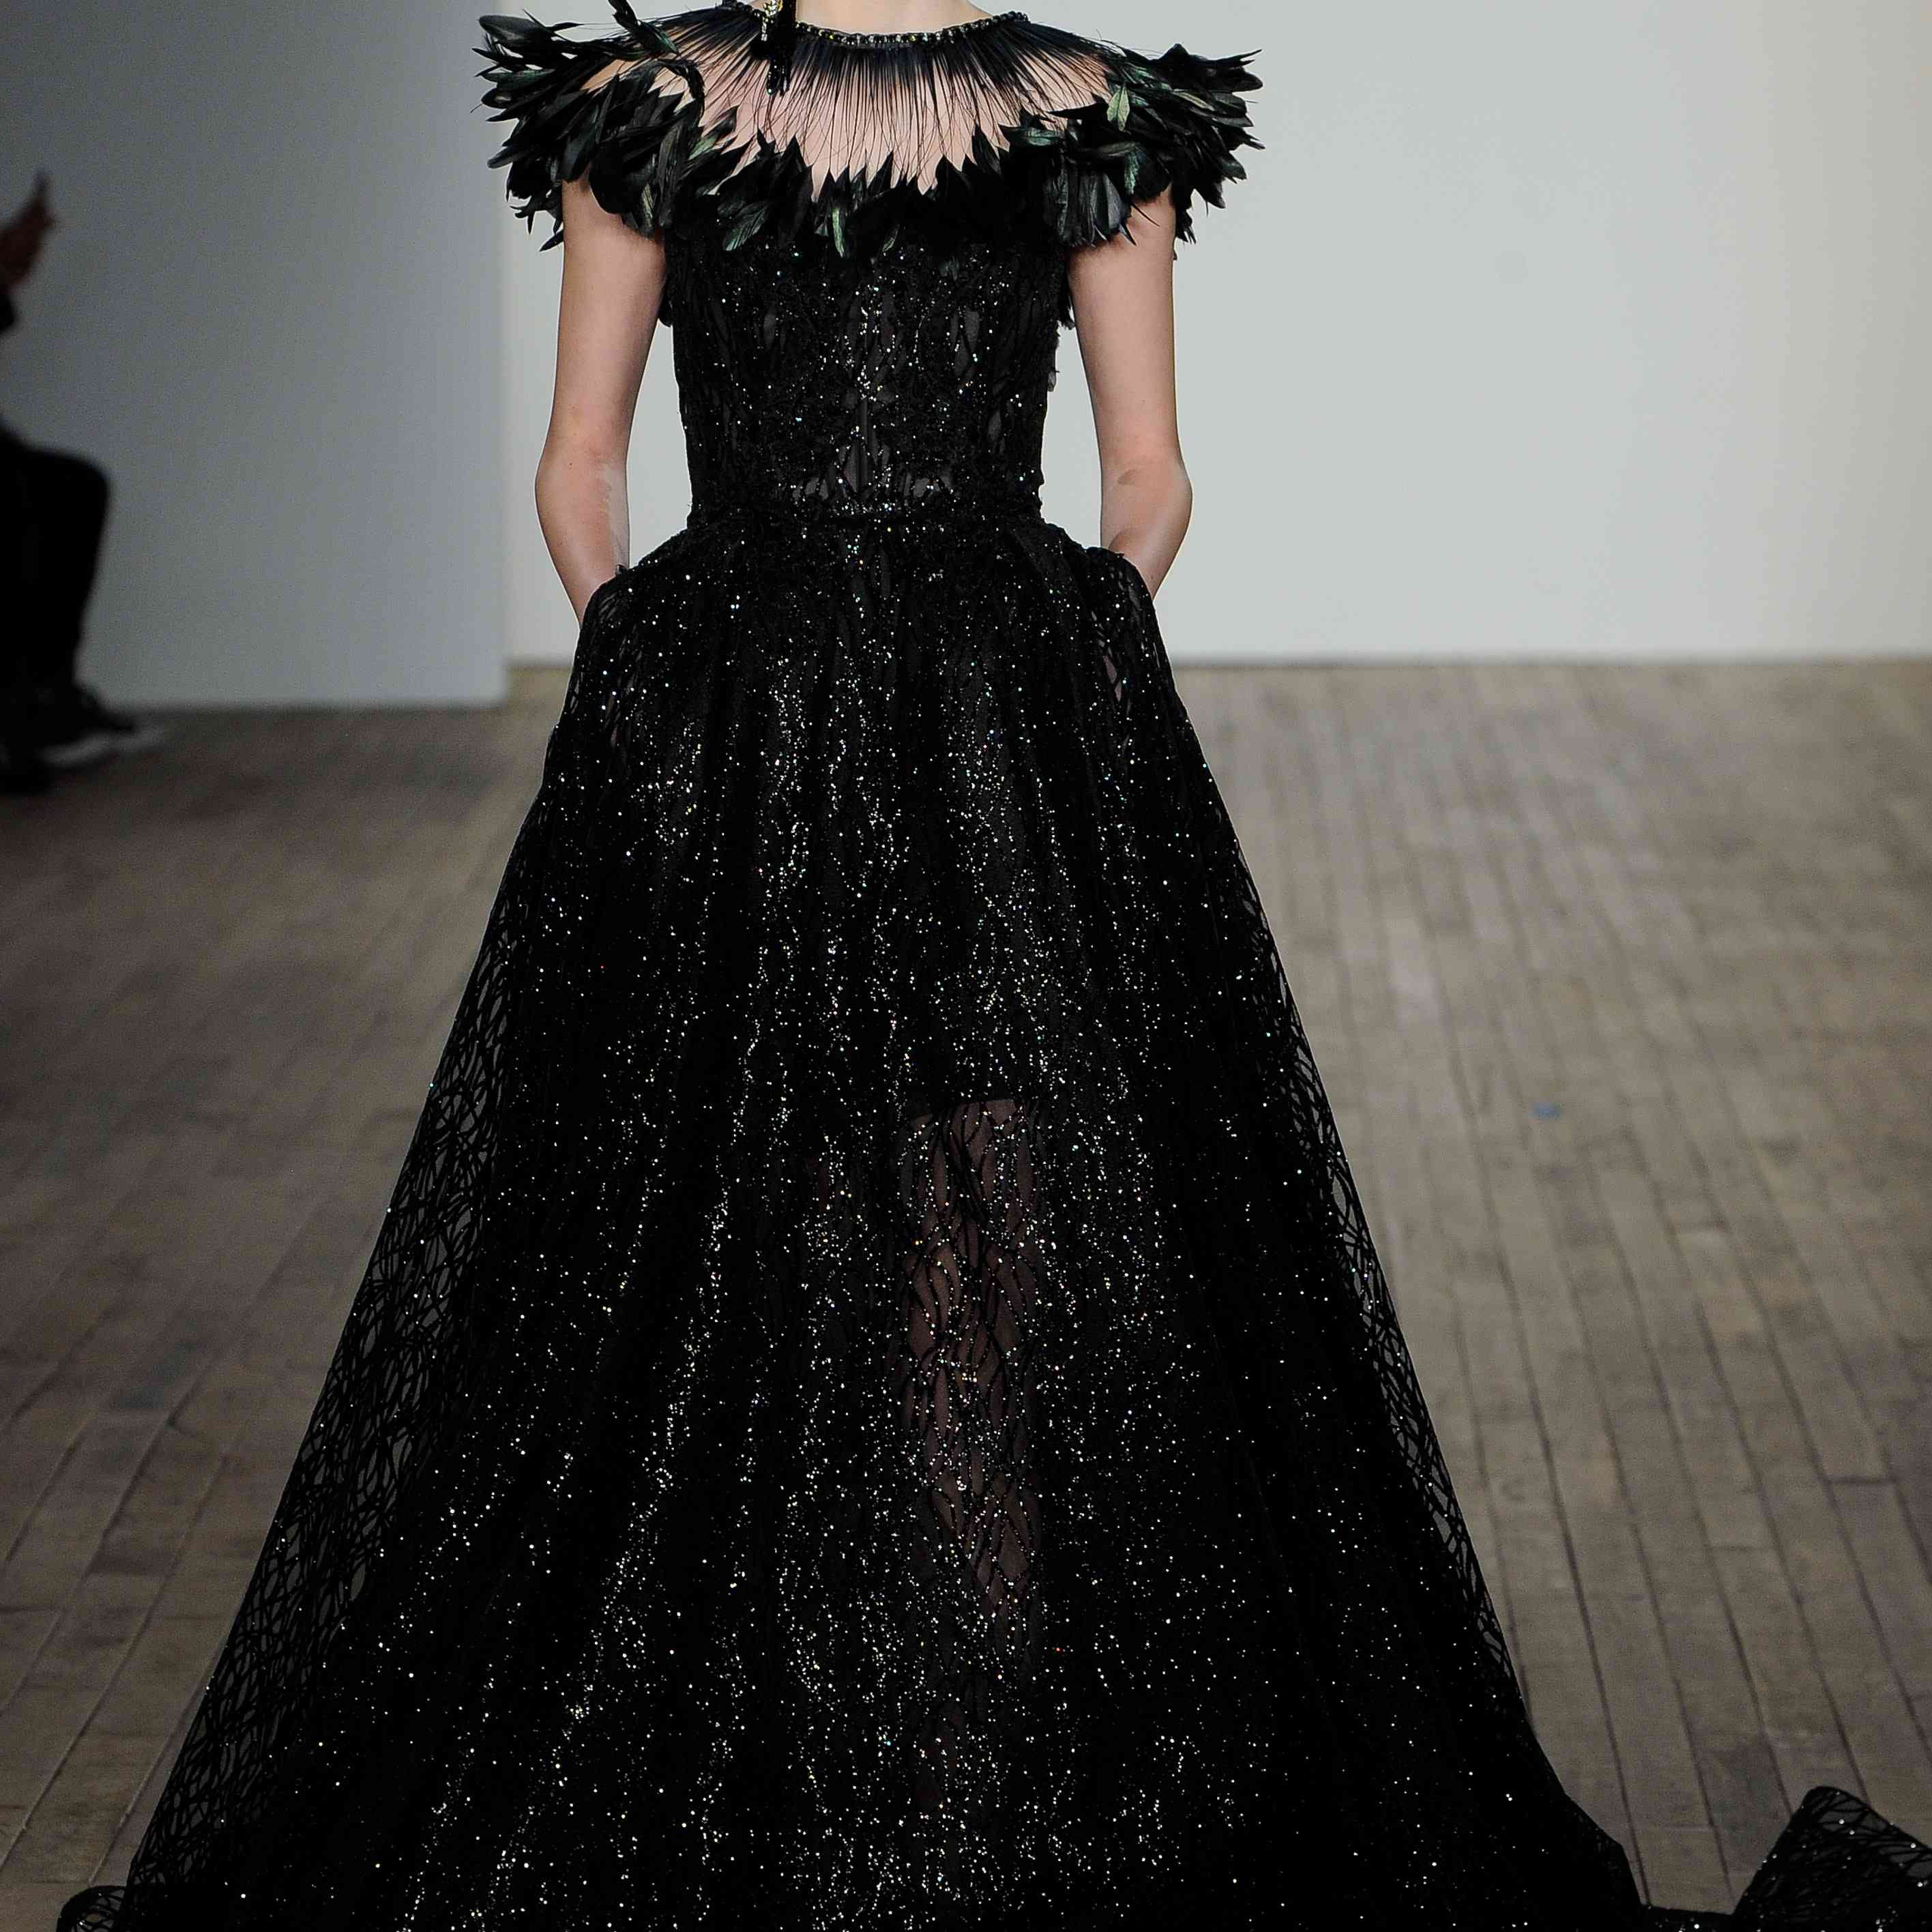 Veronica black strapless wedding dress lazaro